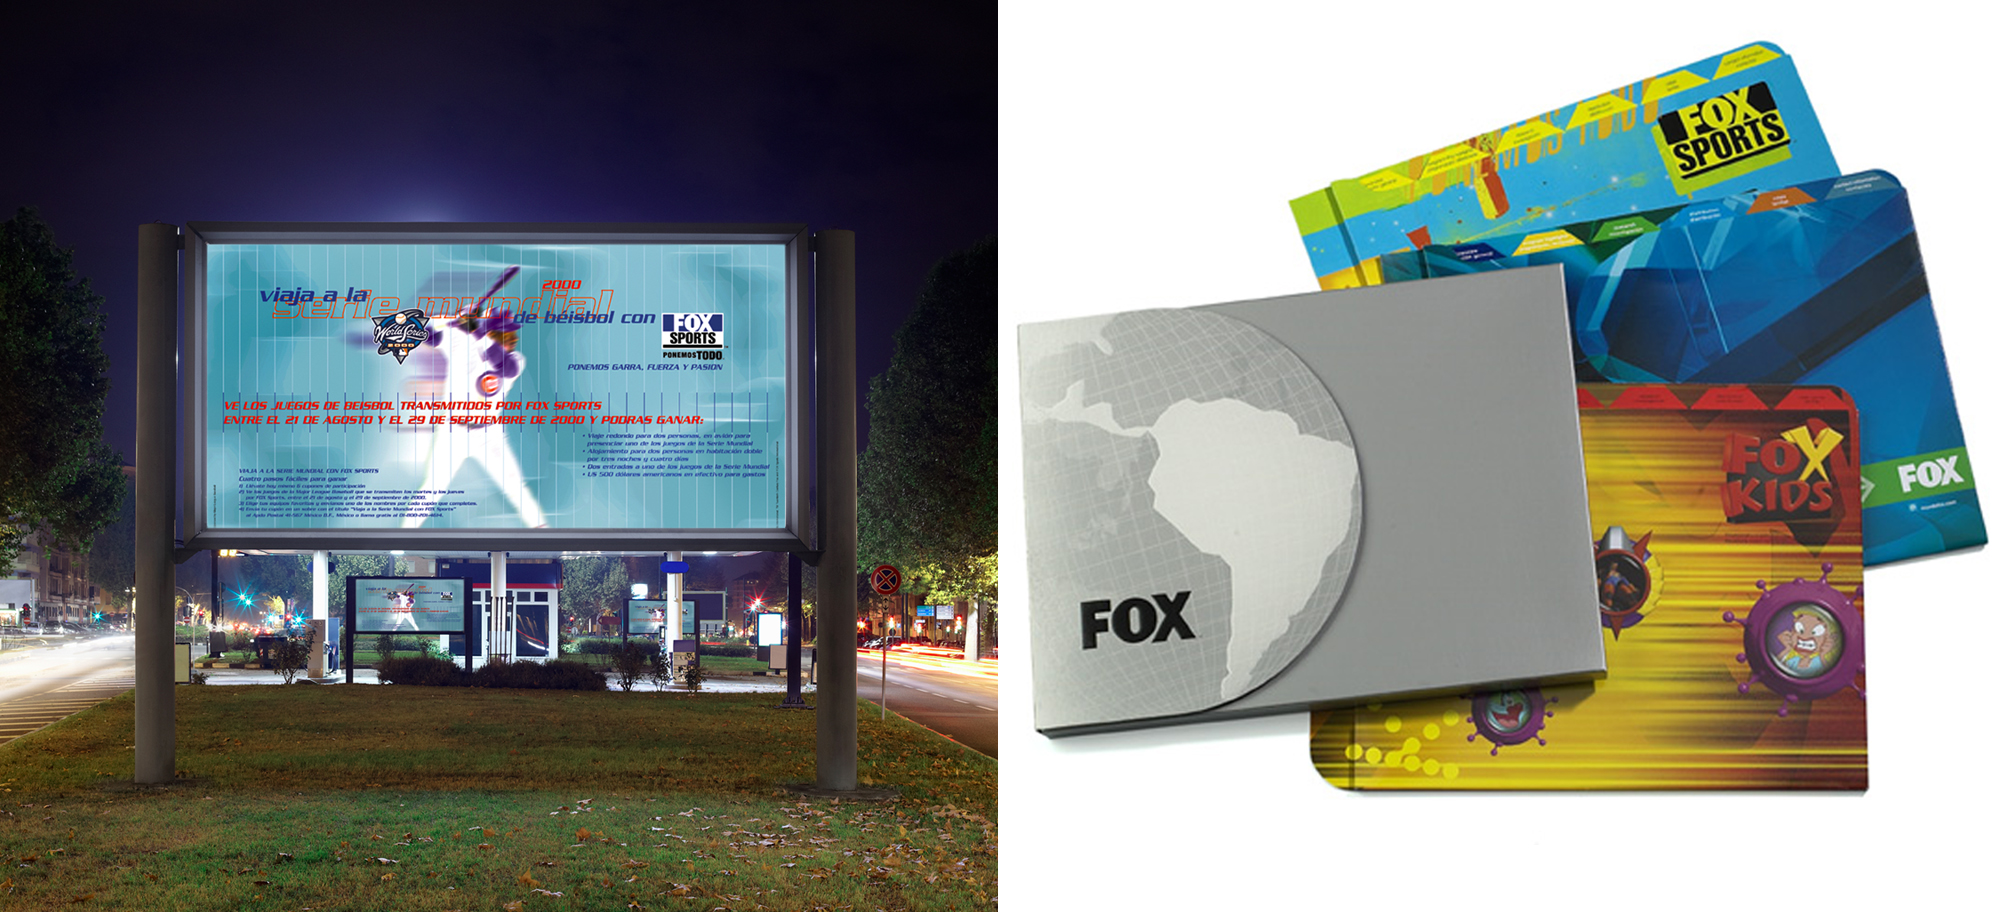 Launching the Fox Network LatAm